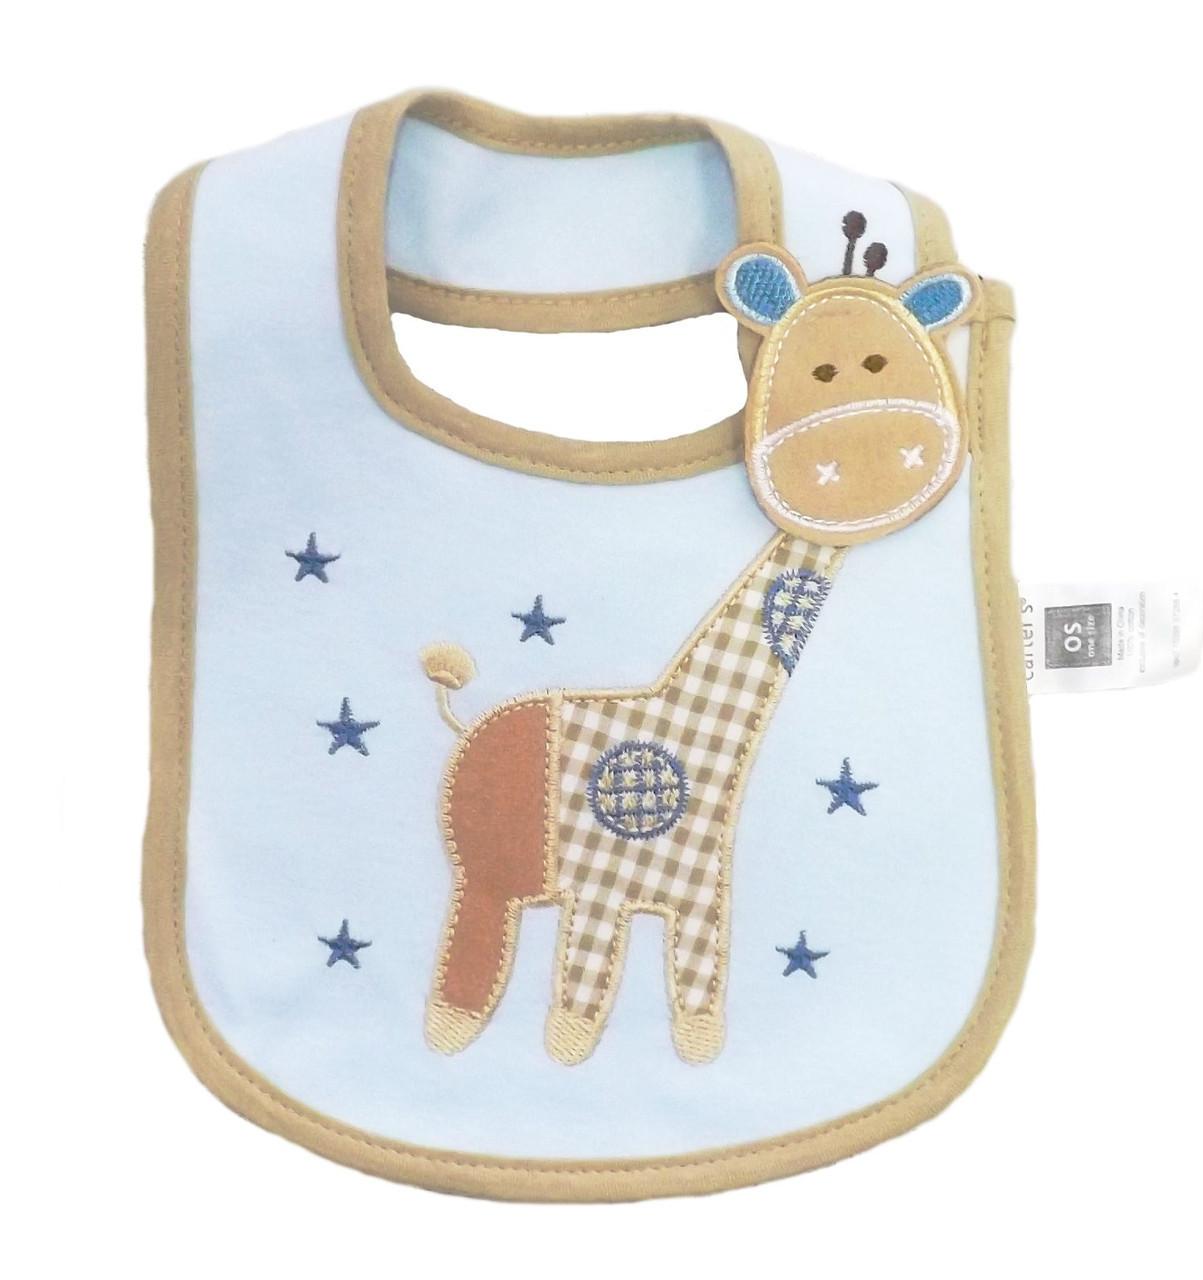 Слюнявчик непромокаемый Жираф (голубой фон)